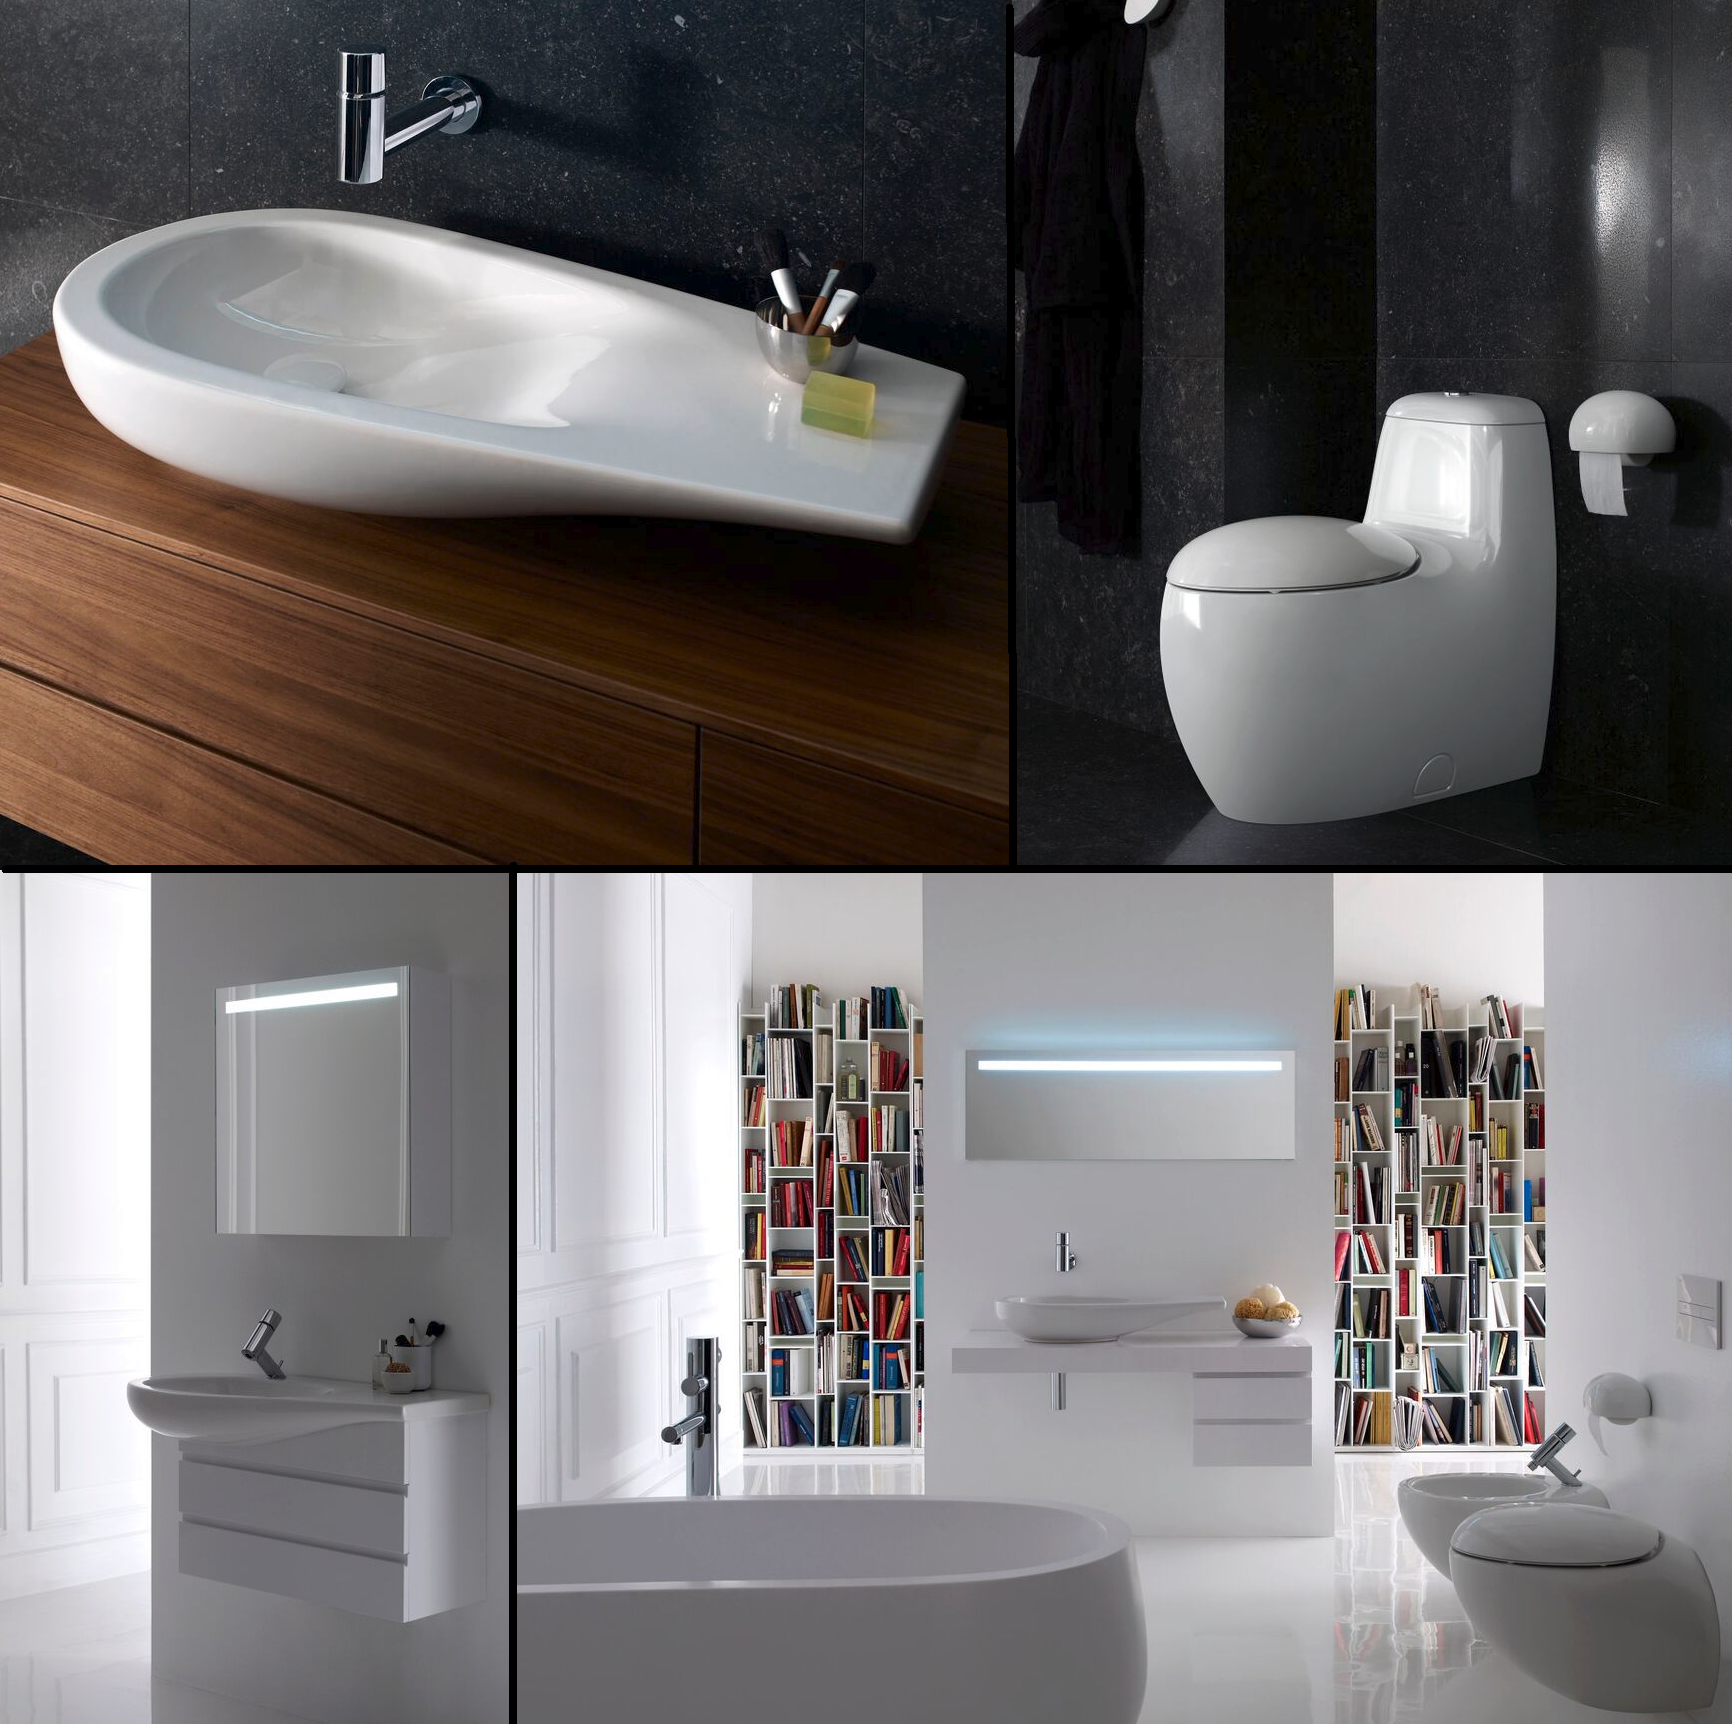 Towel Hook, Toilet Paper Holder And Shelf Towel Holder Are Made Of Ceramic